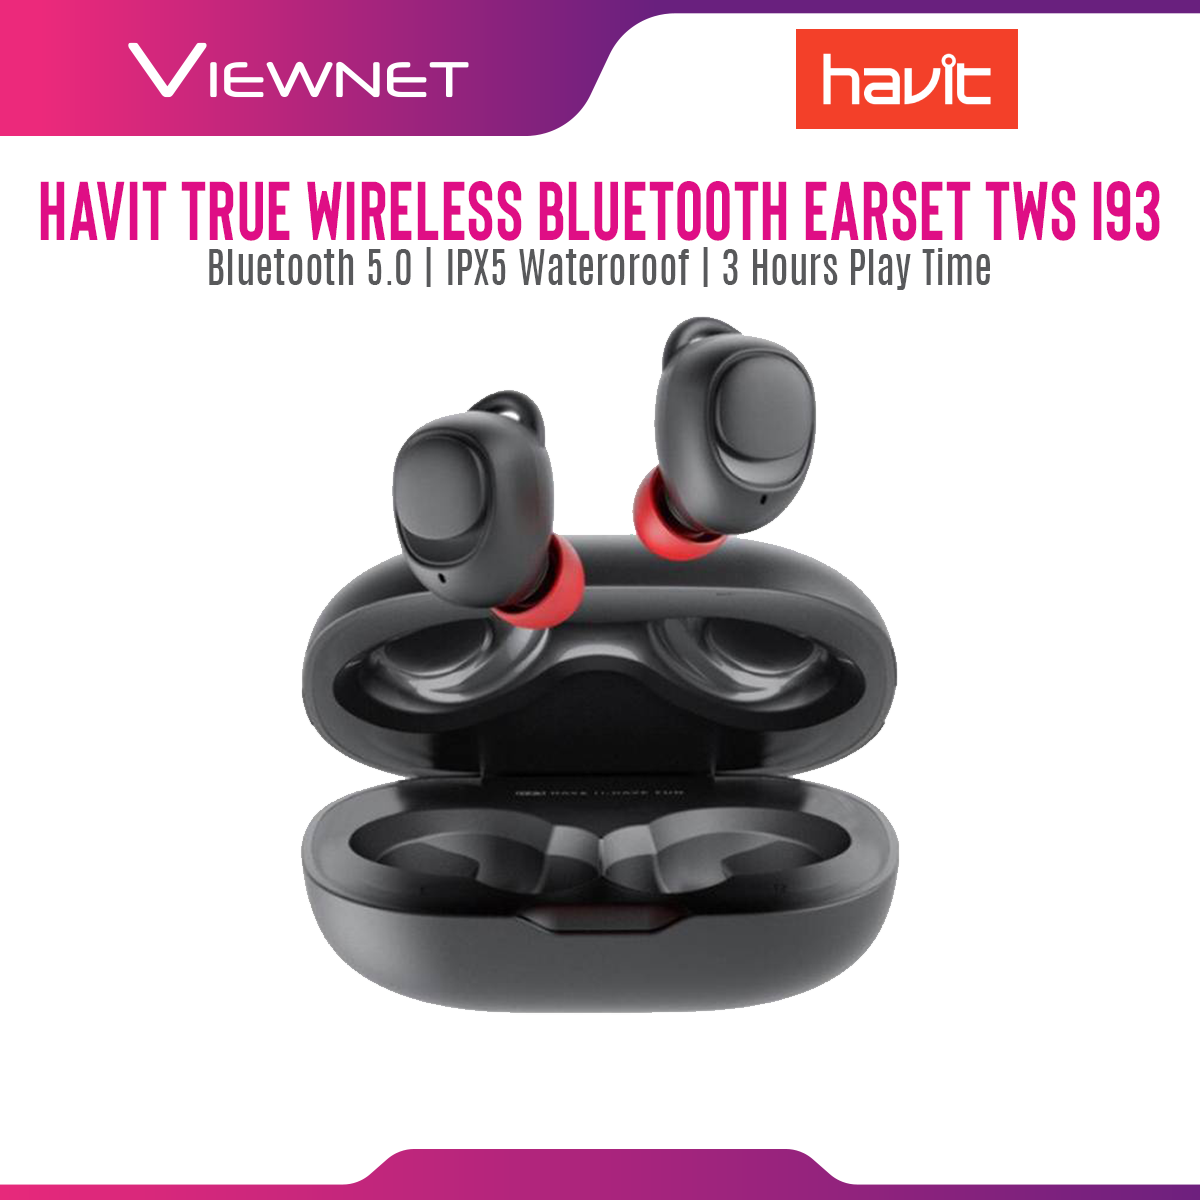 Havit I93 TWS True Wireless Stereo Earbuds IPX5 Waterproof Bluetooth V5.0 Touch Button Sport In-ear Earphone Headset with 500mAh Charging Case